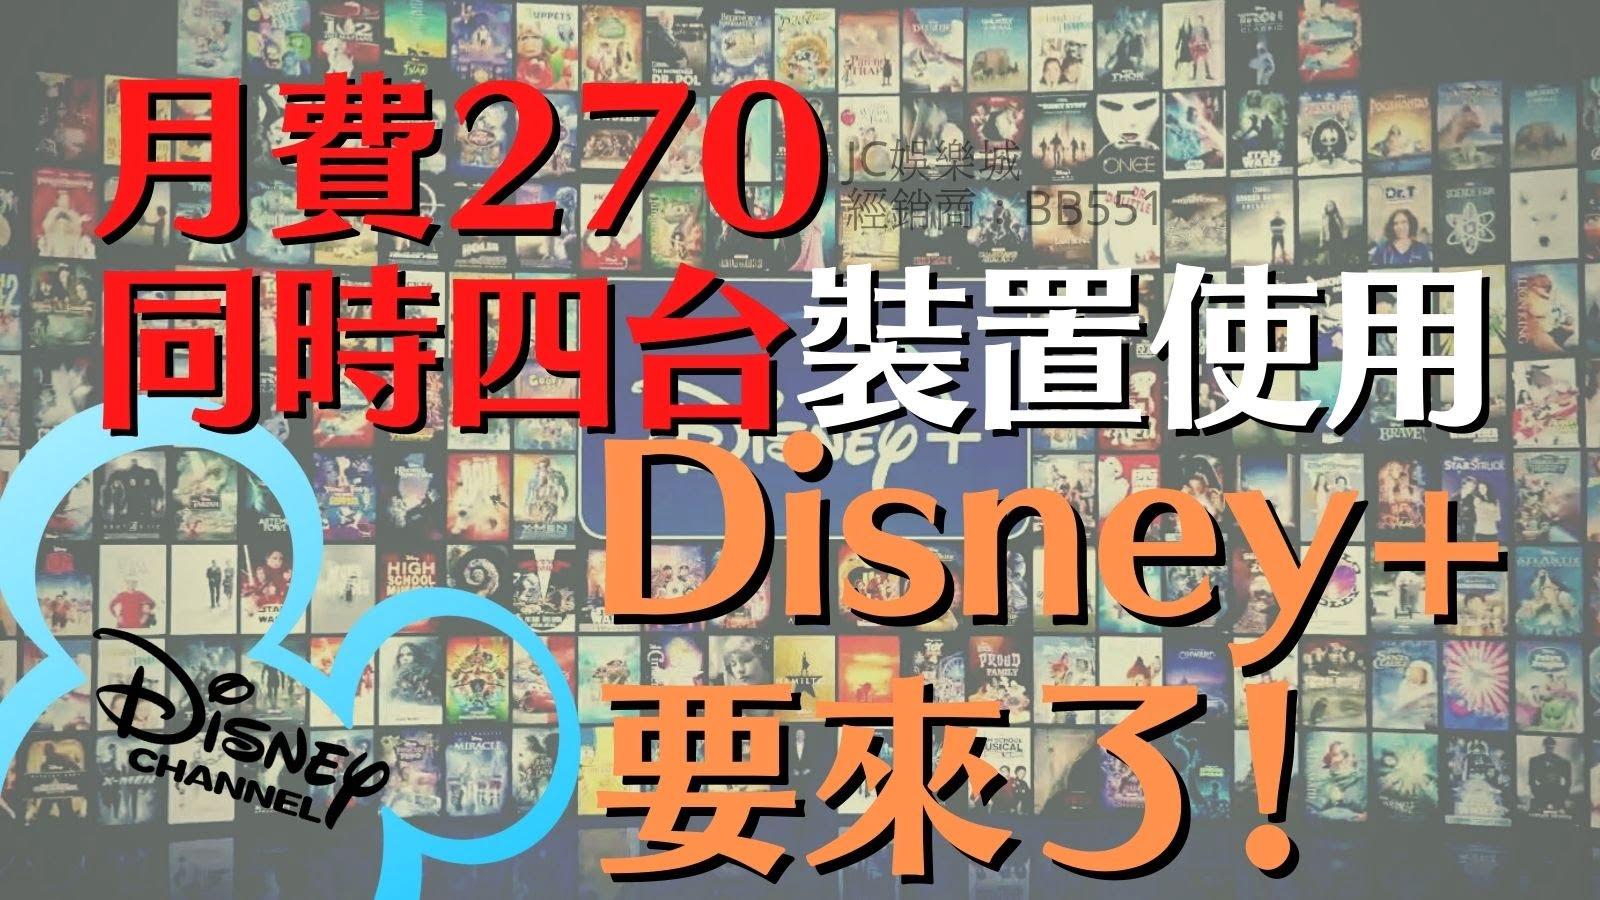 【Disney台灣頻道介紹】台灣可以看Disney+影集了!Disney+收費方案說明